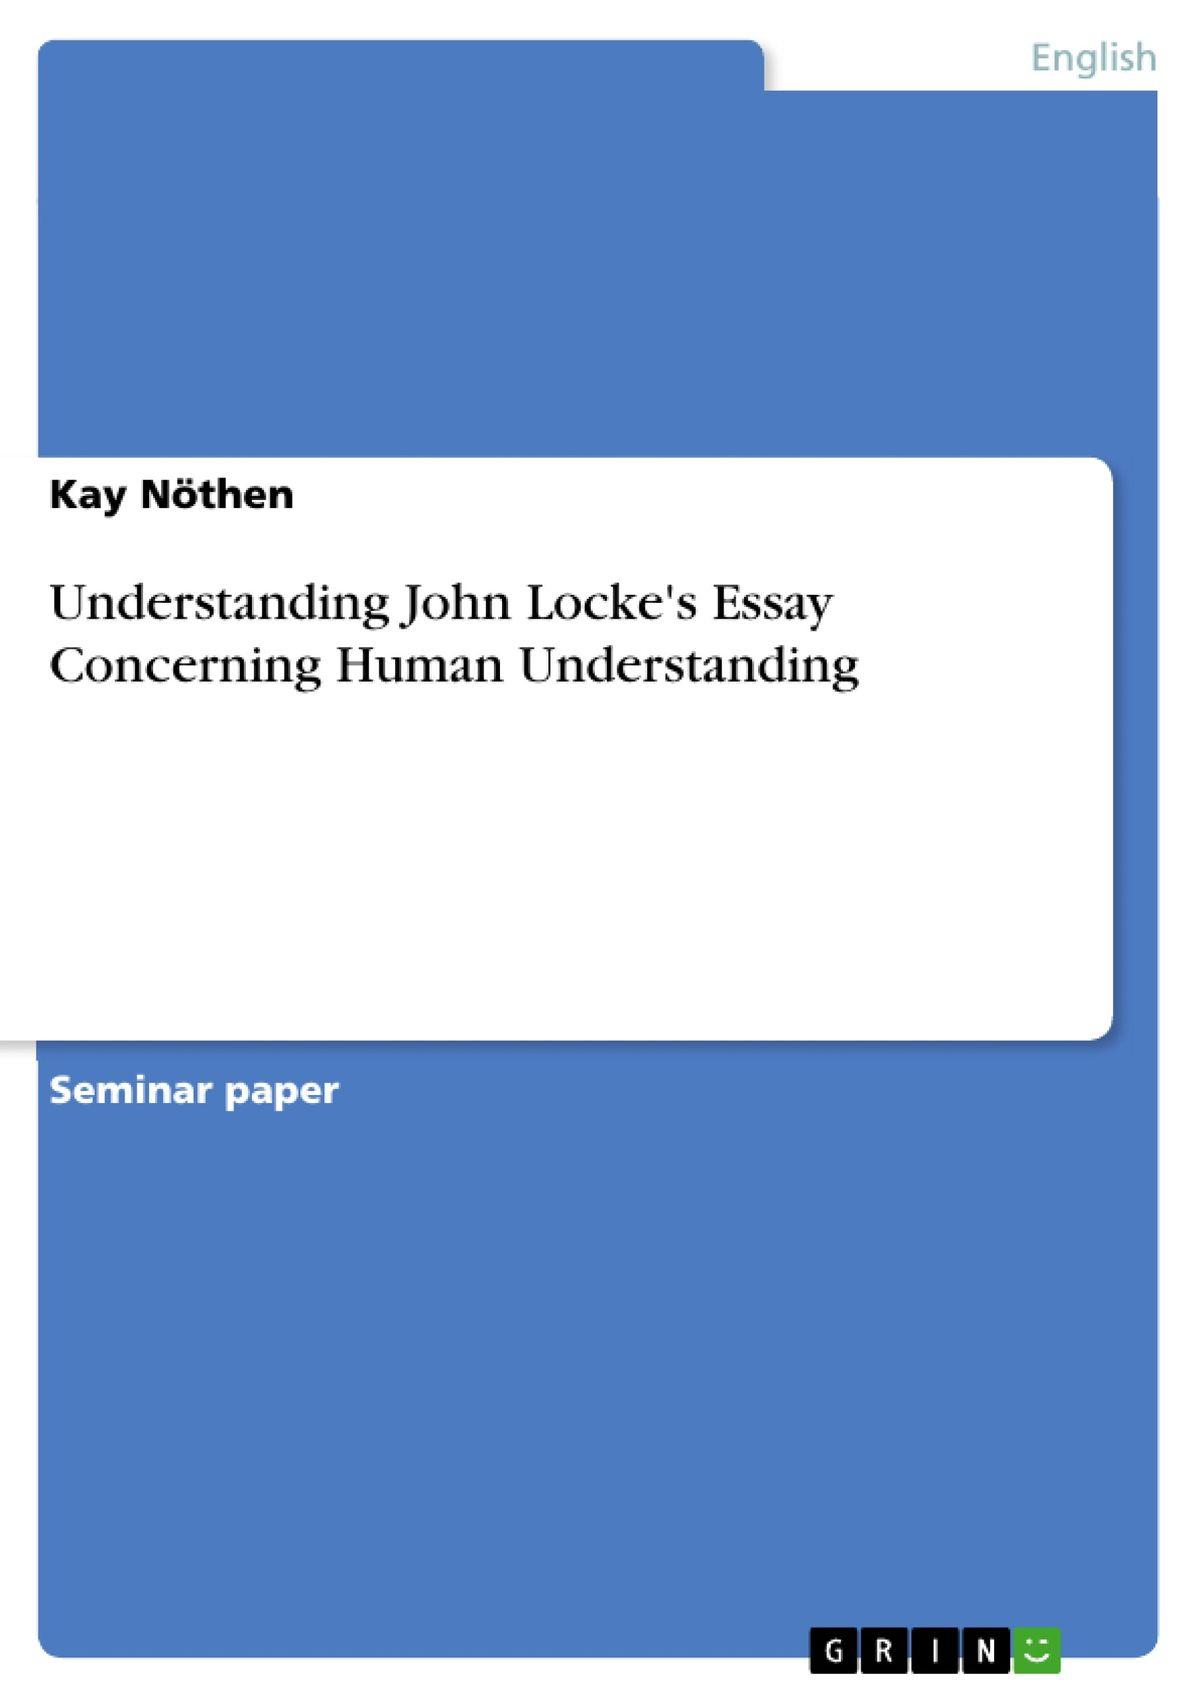 009 Essay Example Understanding John Locke S Concerning Human Stunning An Book 2 Chapter 27 Summary Analysis Tabula Rasa Full